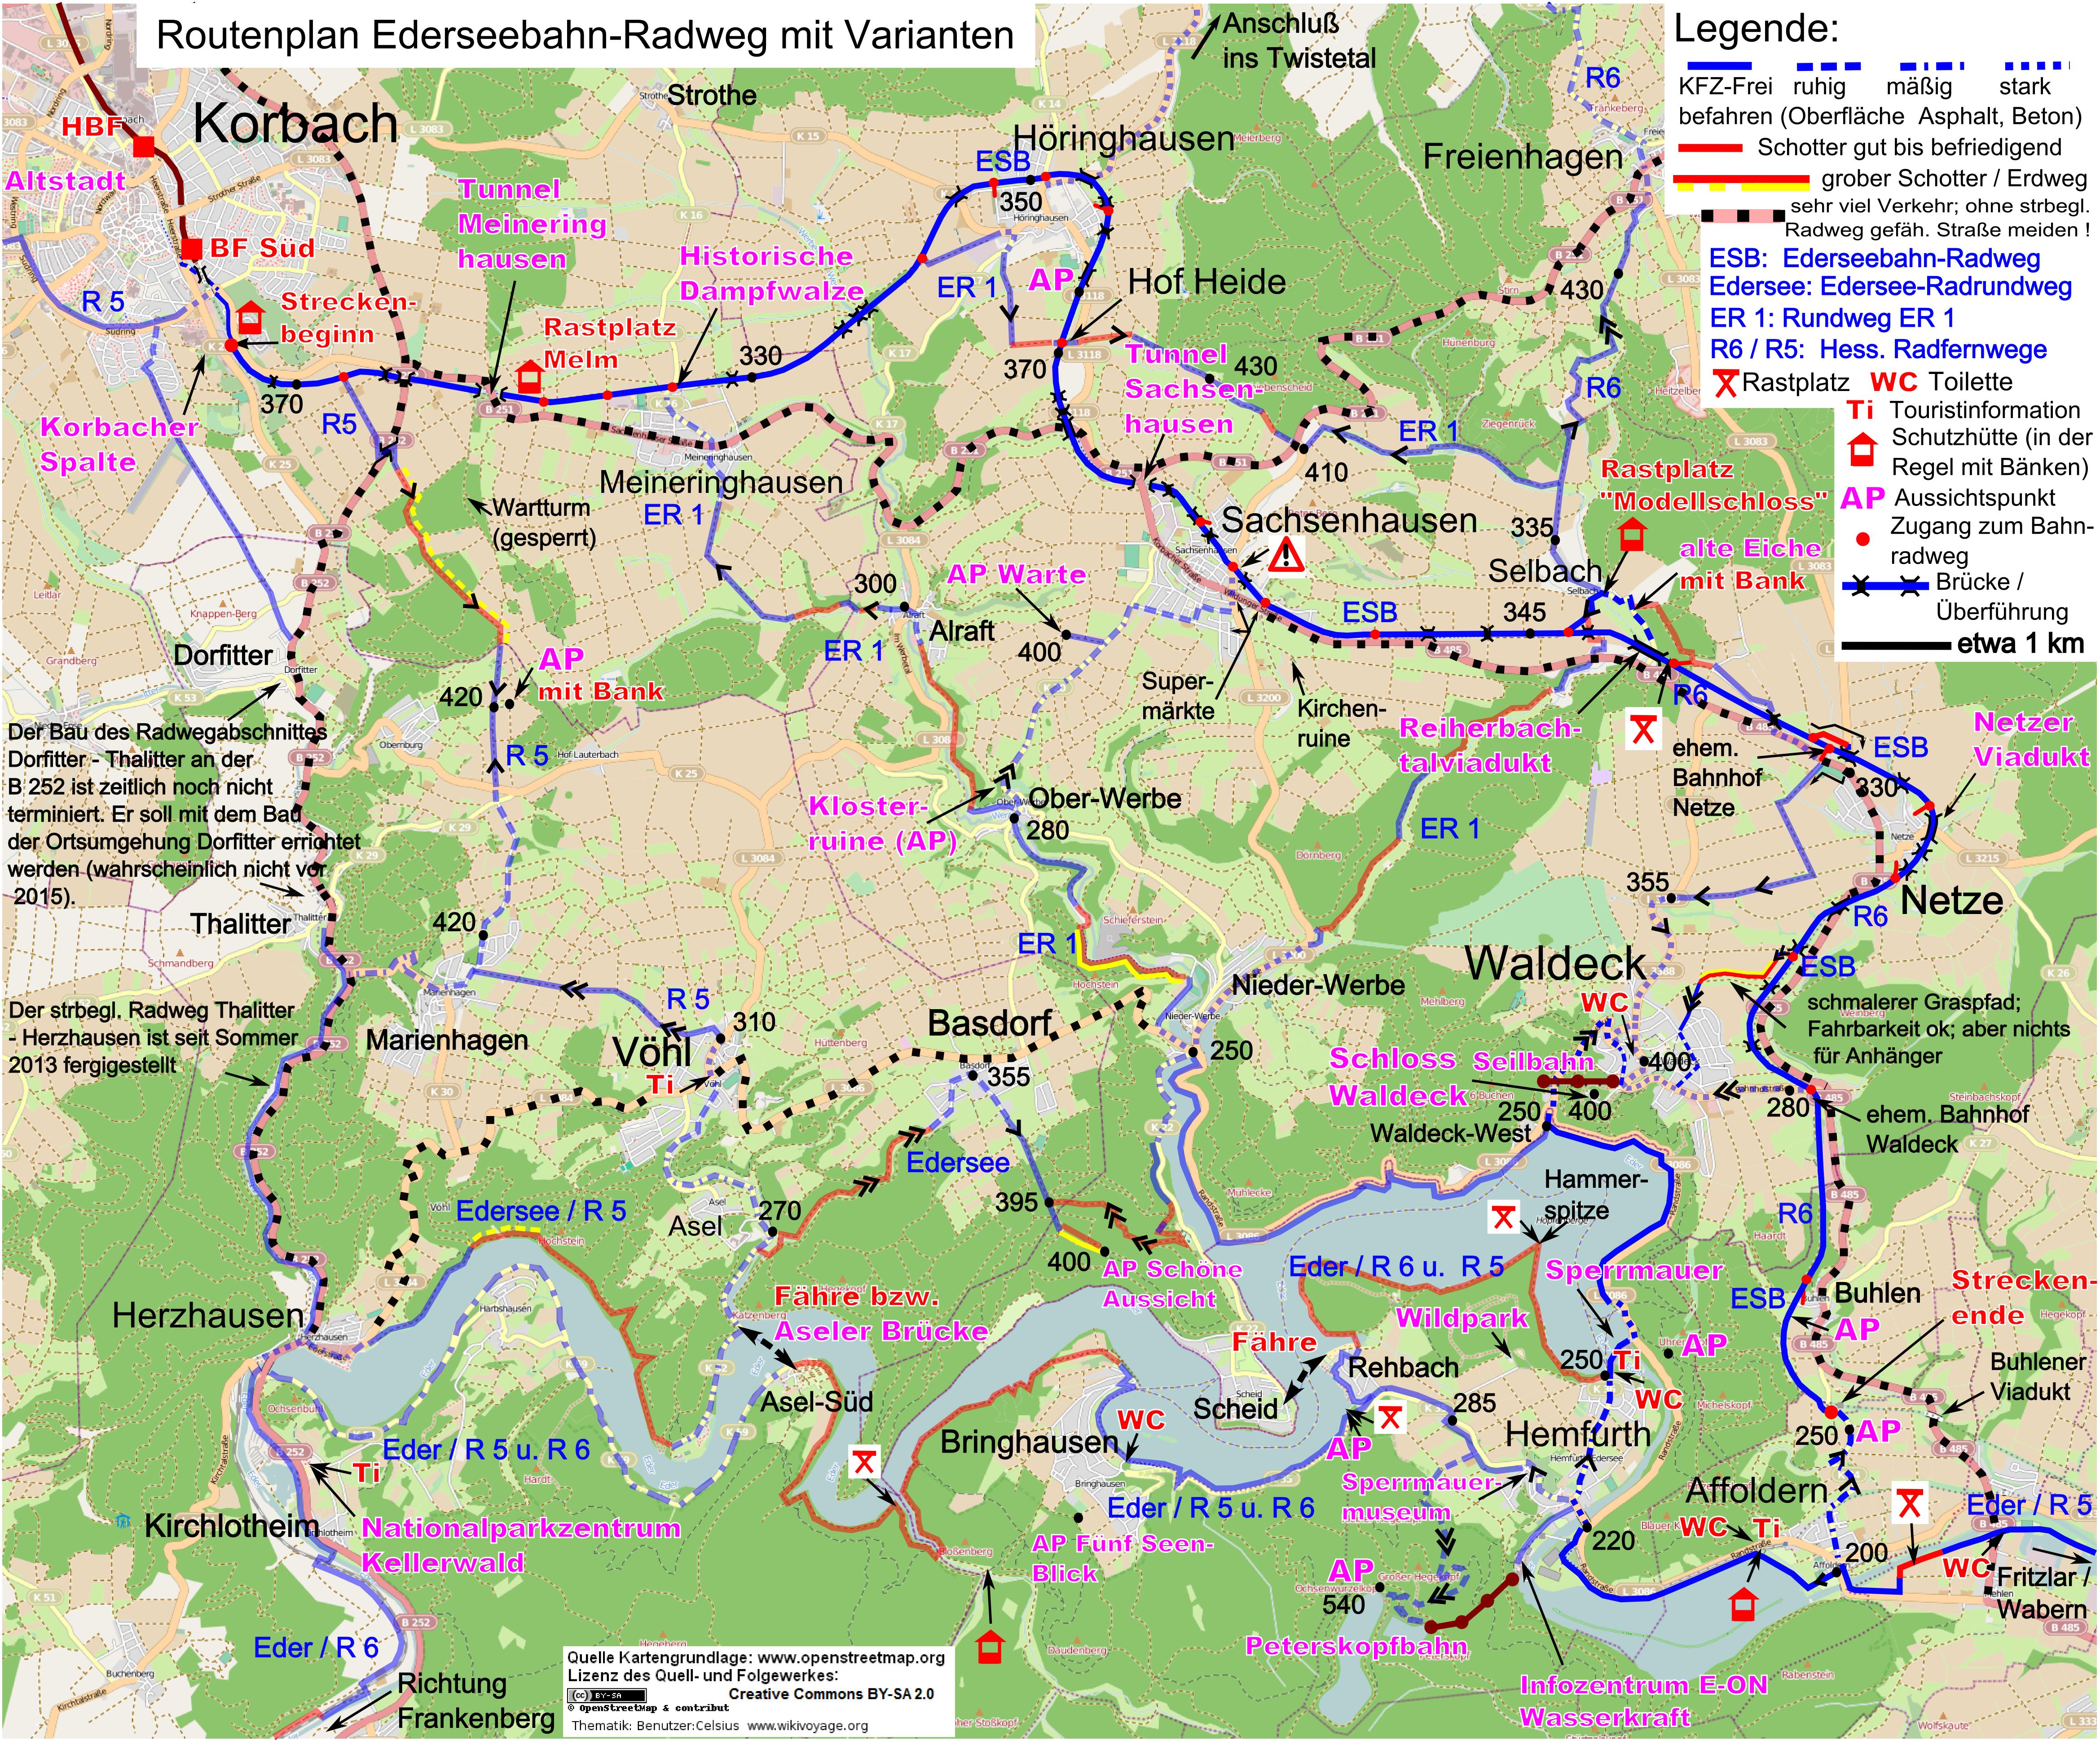 Mosel Radweg Karte Pdf.Edersee Radtour Drupal